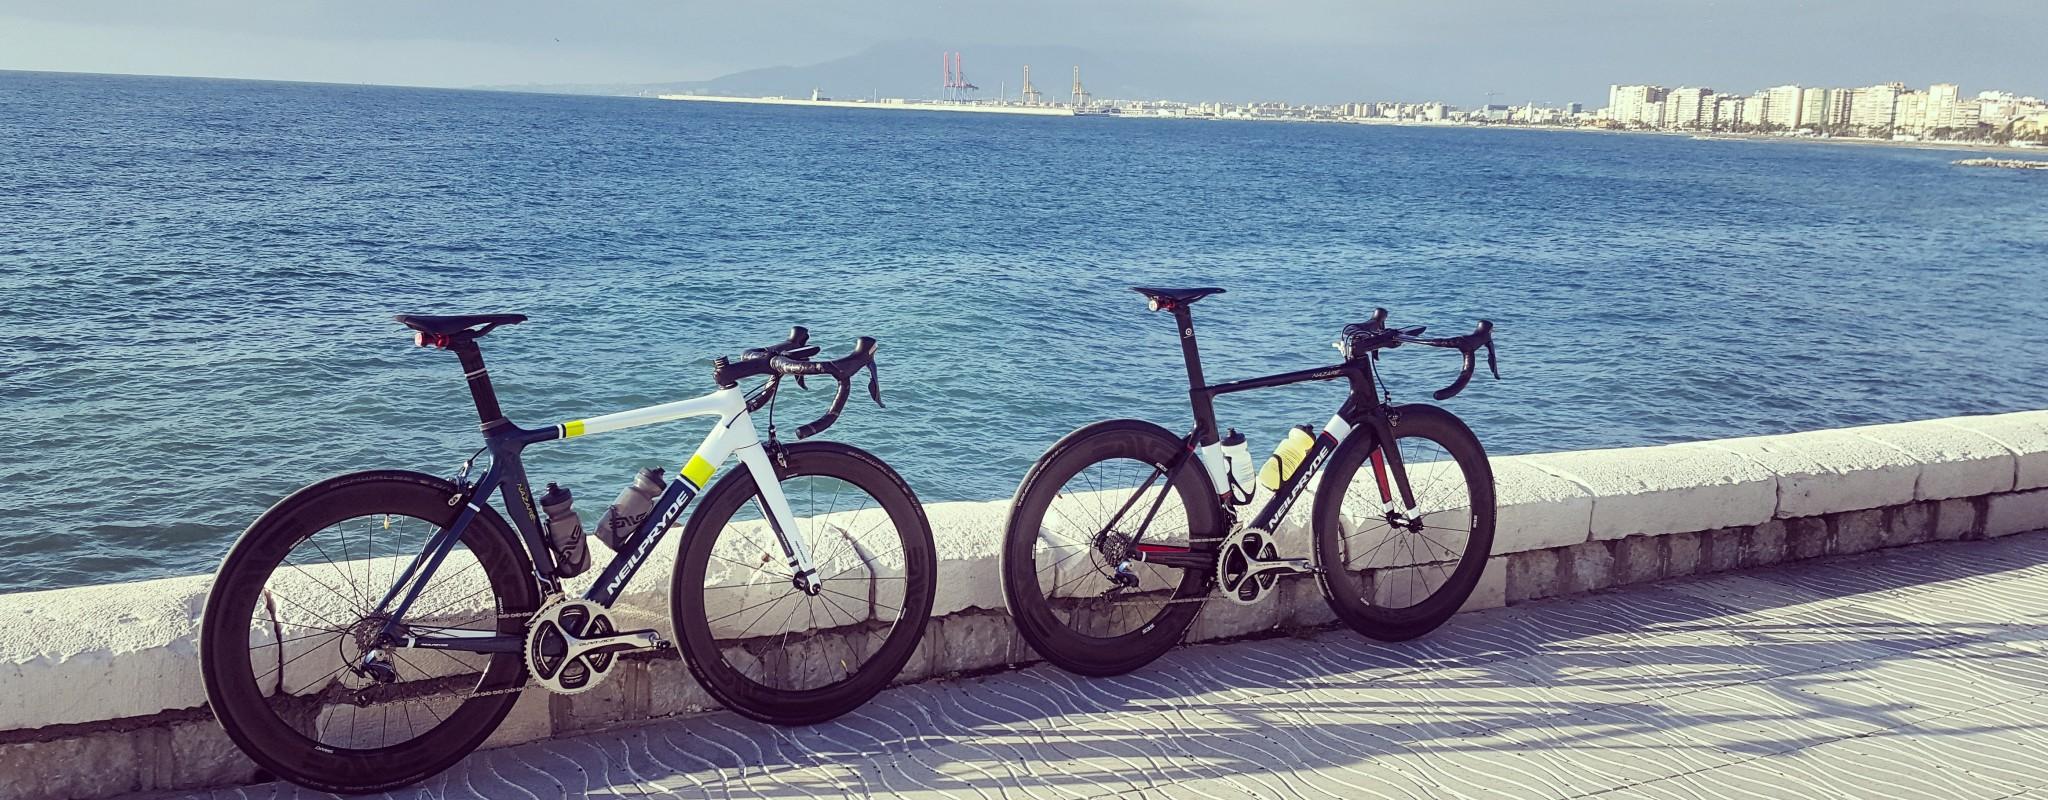 Neilpryde Bikes